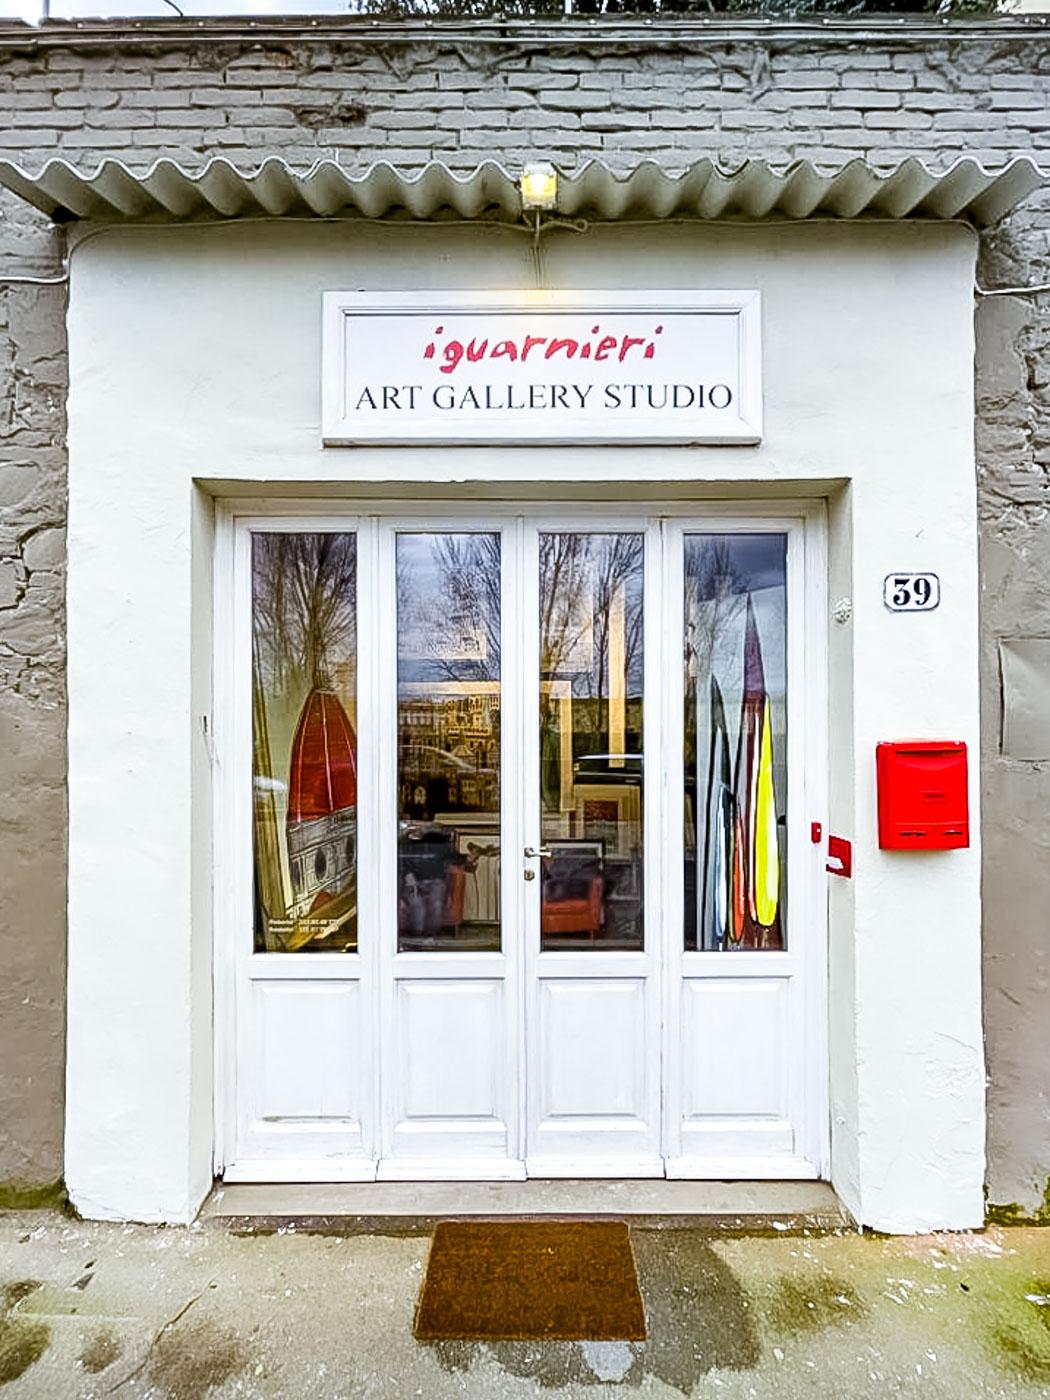 iguarnieri art gallery studio